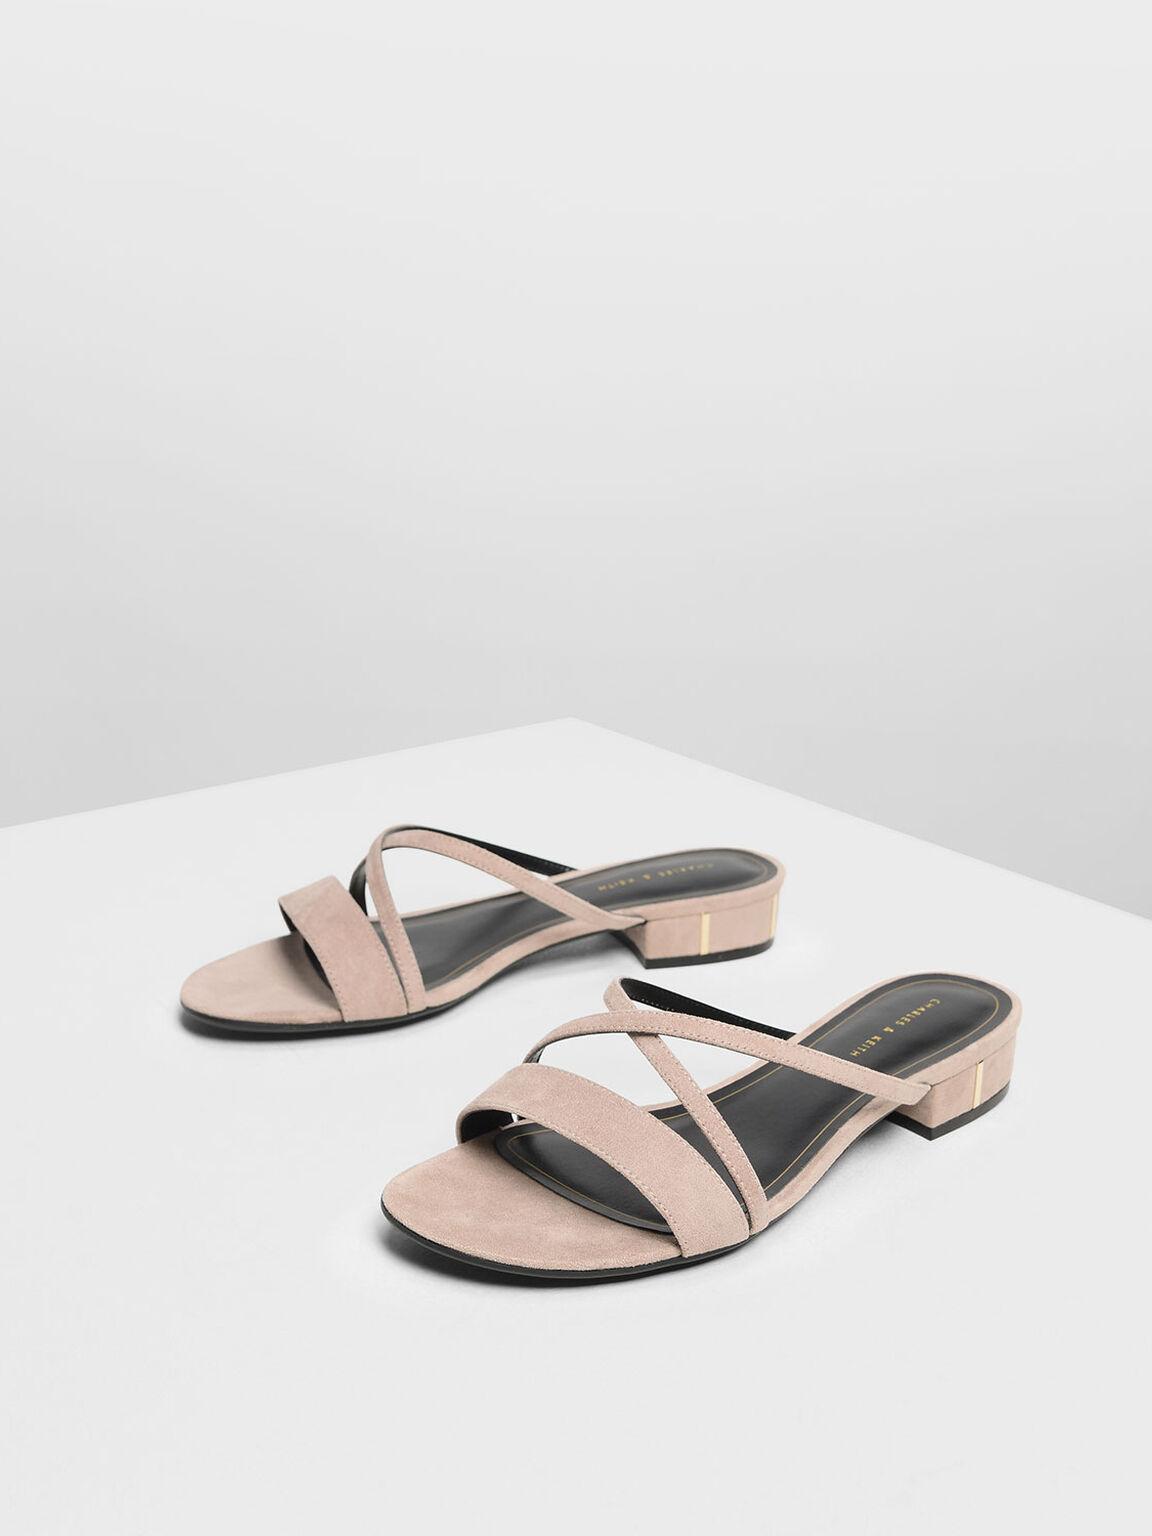 Criss Cross Strappy slide Sandals, Beige, hi-res